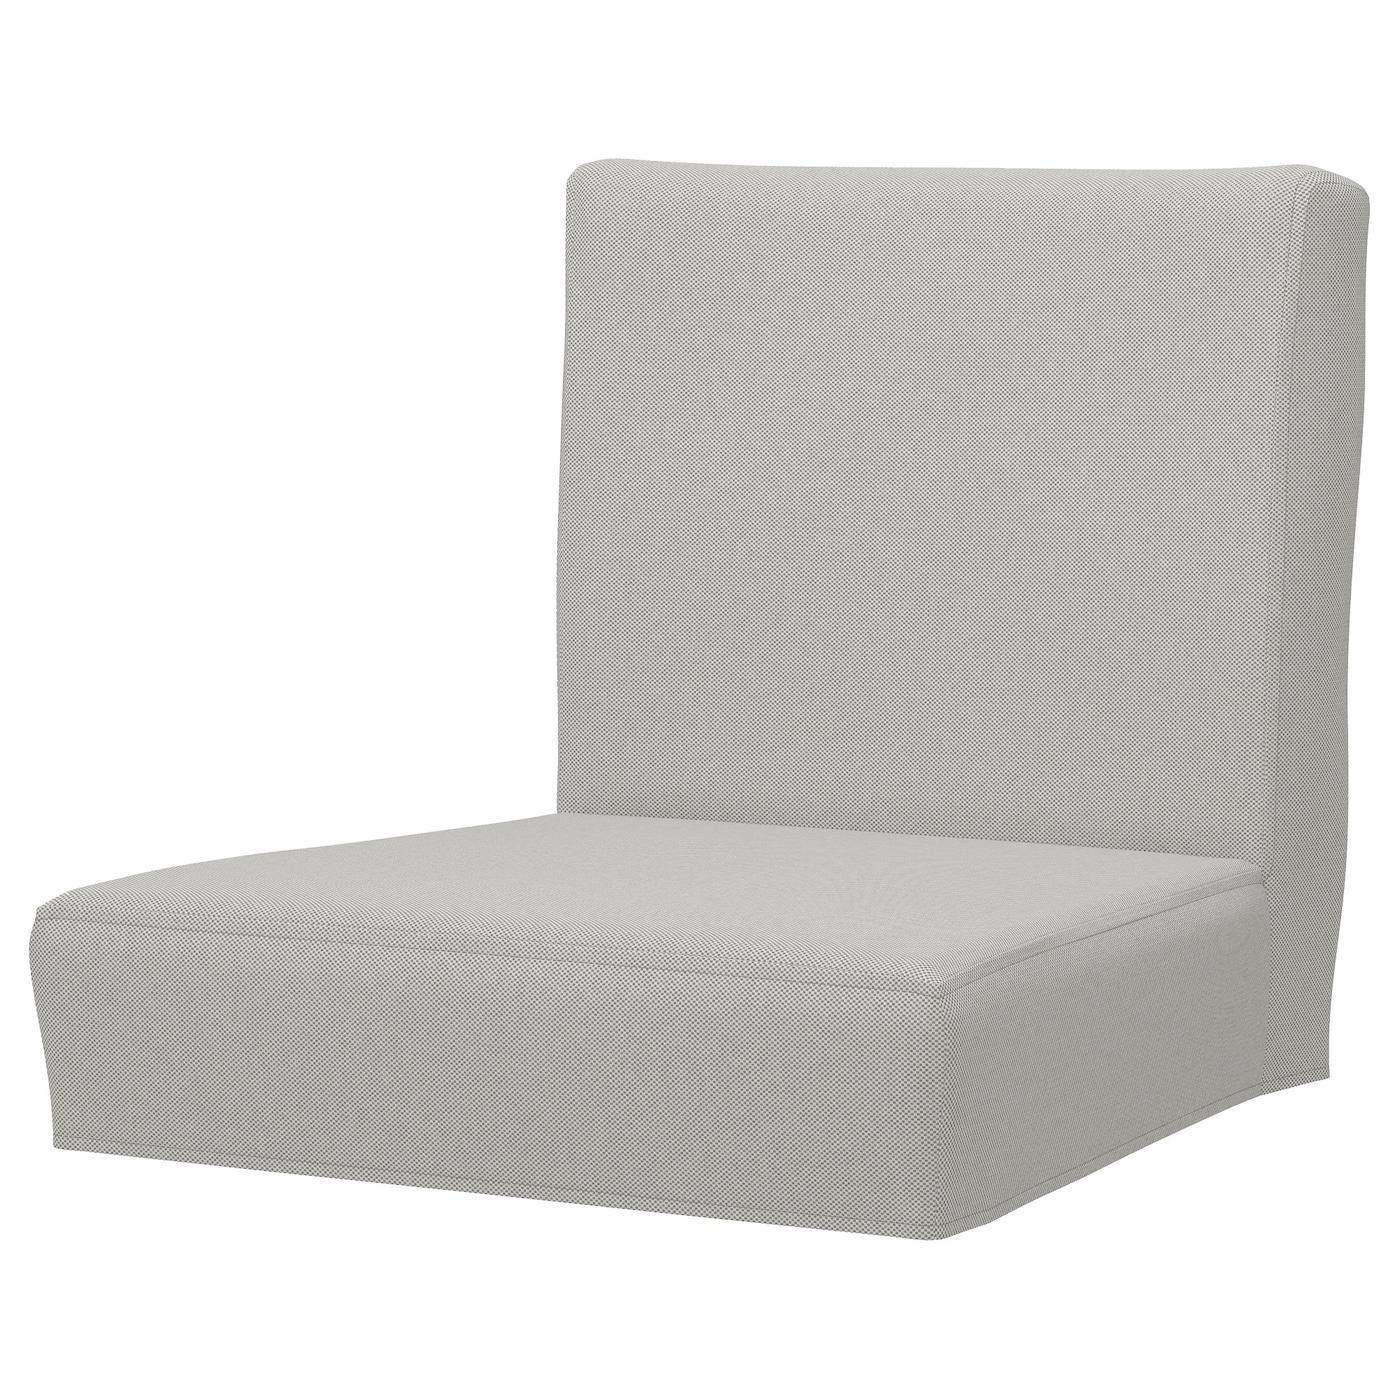 Dining Chair Covers Ikea Dublin Ireland